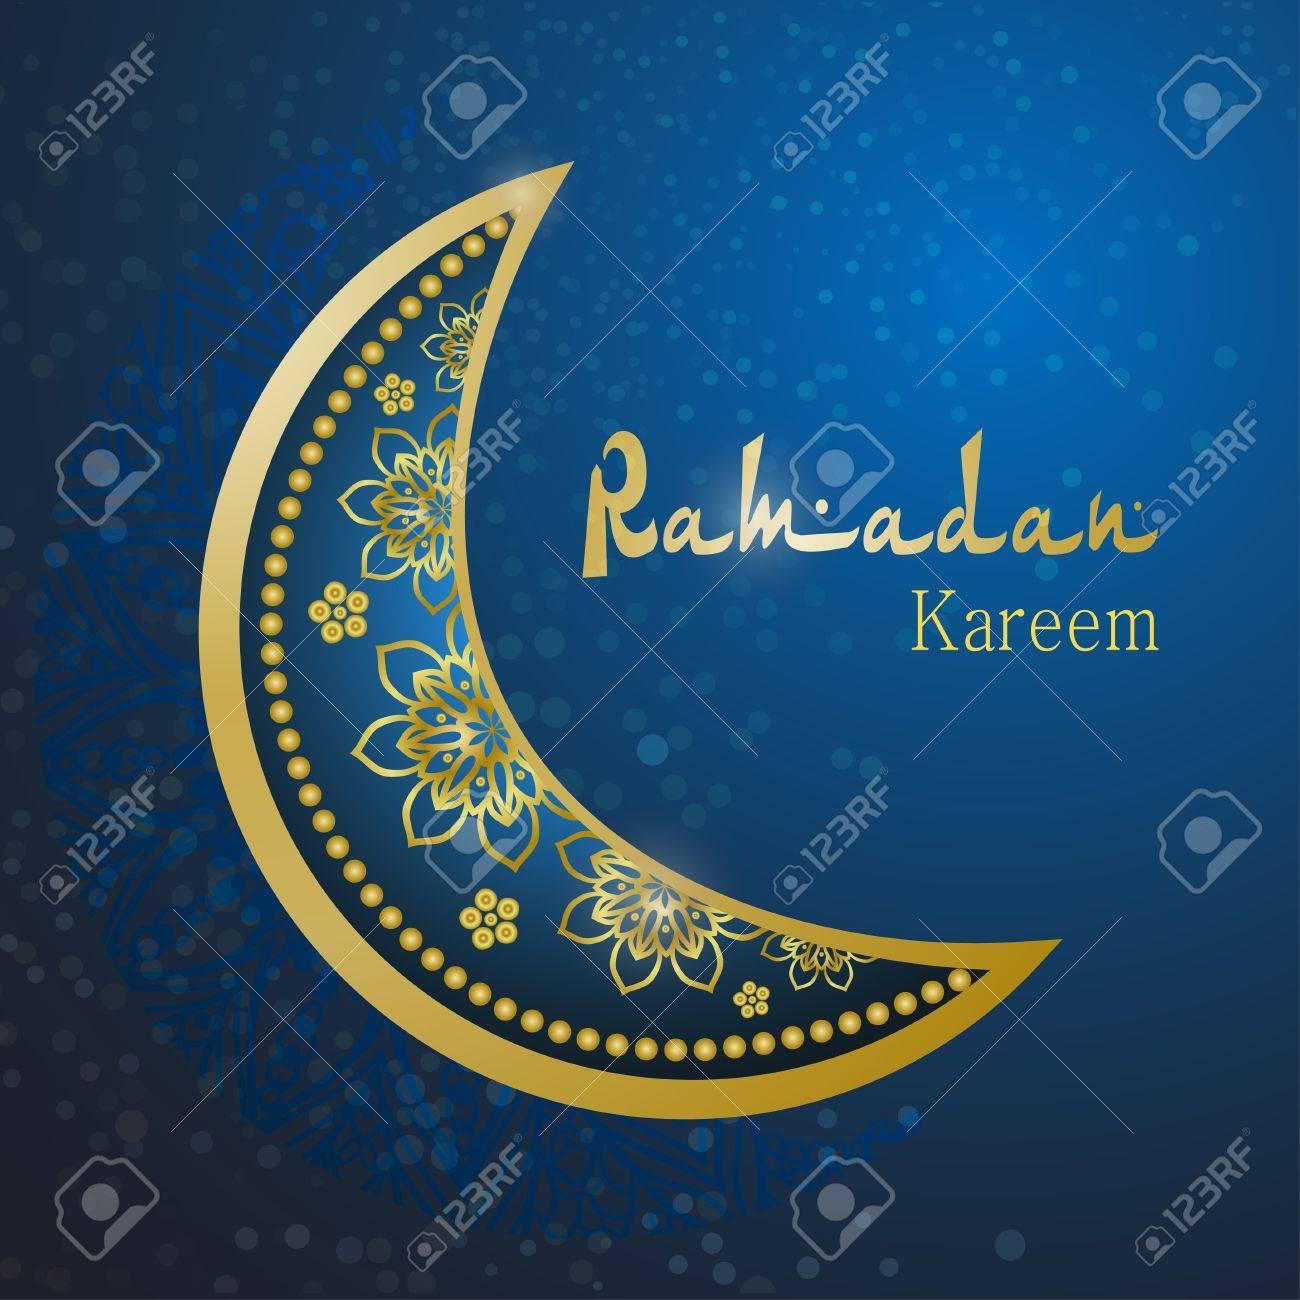 Ornametalof muslim community ramadan kareem invitation card ornametalof muslim community ramadan kareem invitation card in vector perfect cards for any other stopboris Choice Image